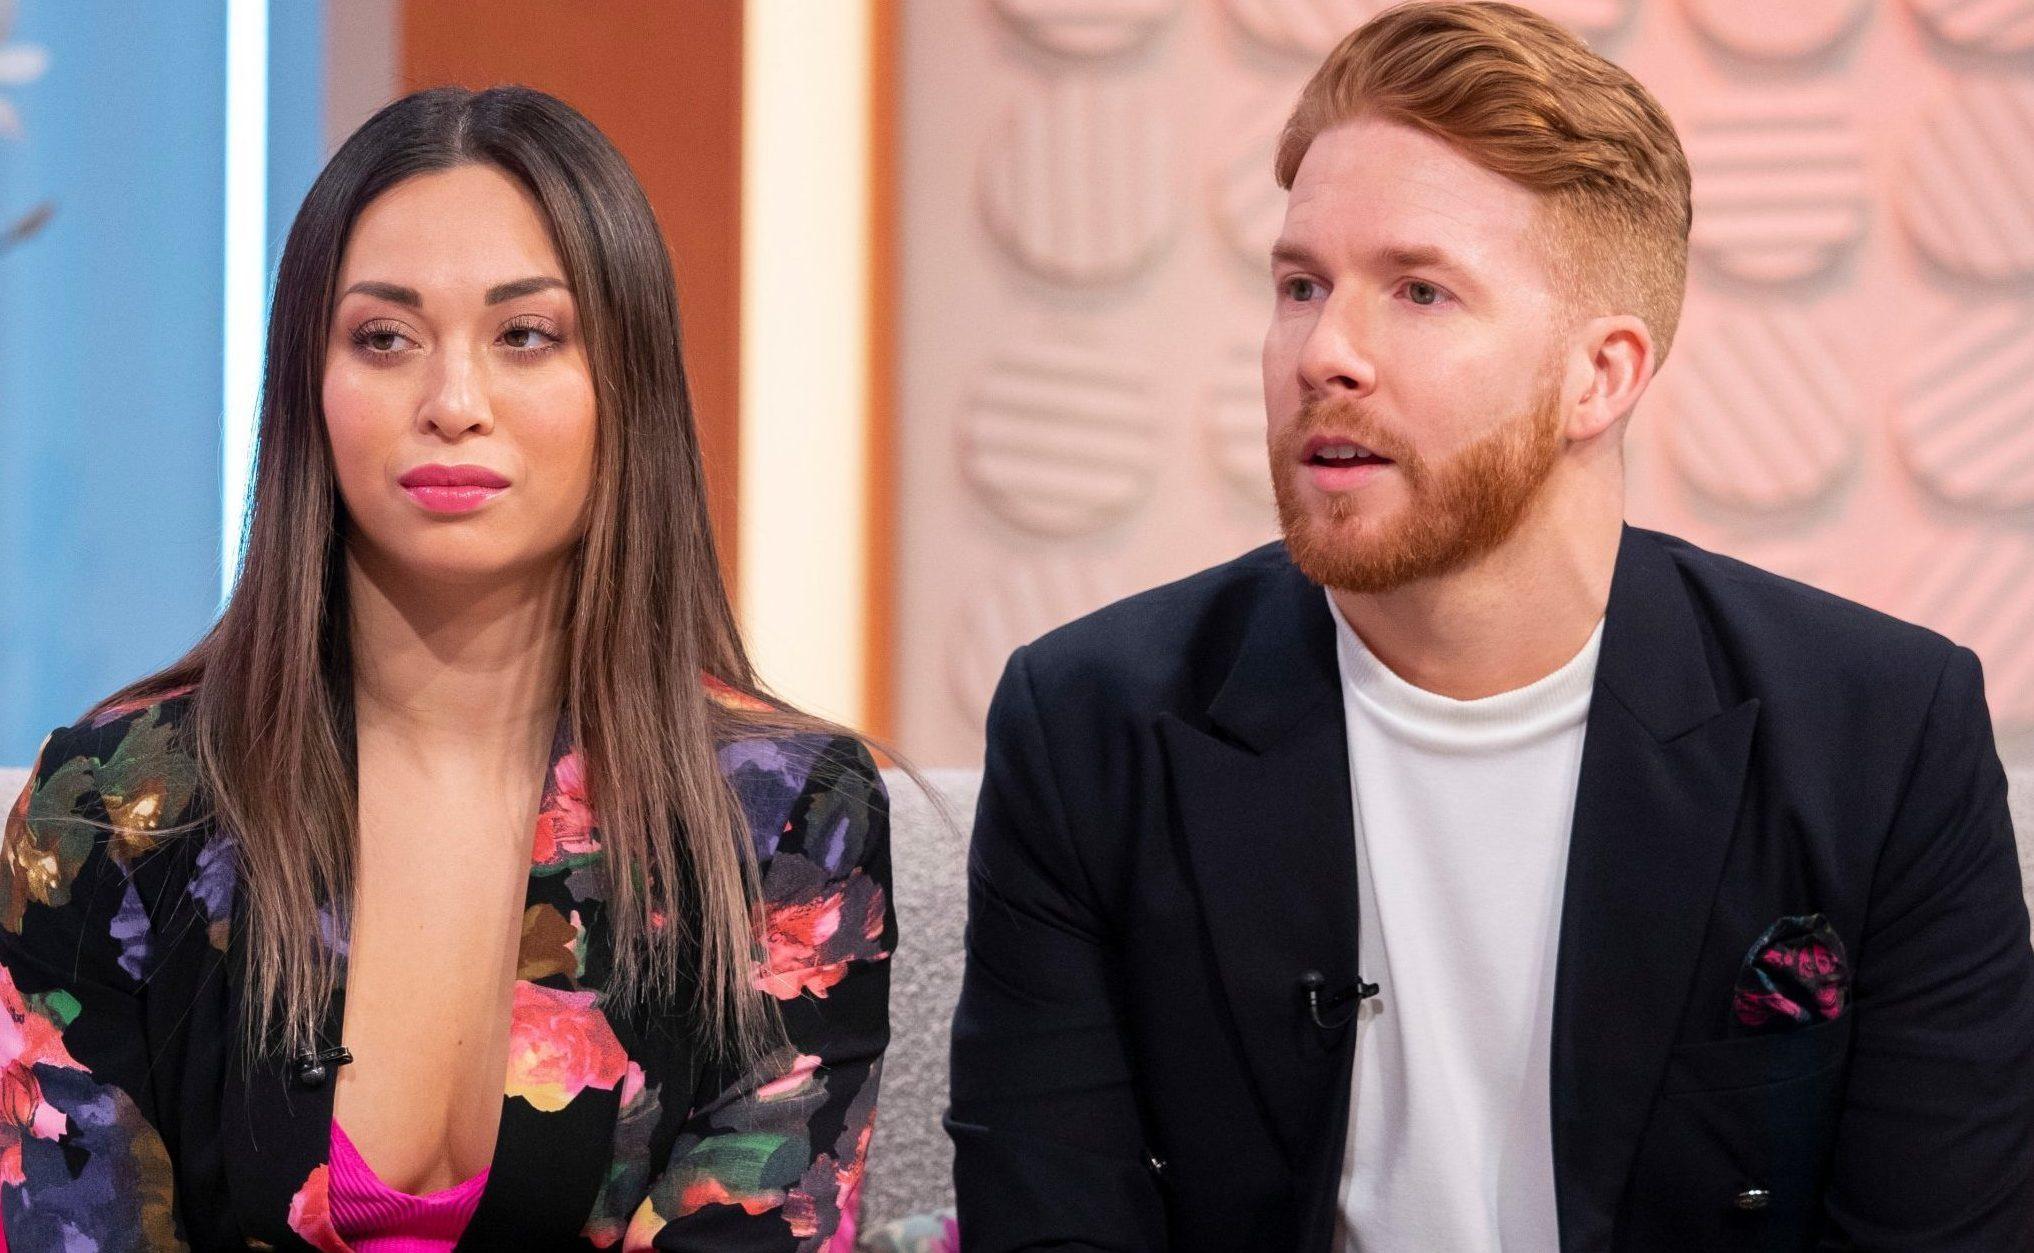 Strictly Come Dancing's Neil Jones reveals dream celeb dance partner for wife Katya